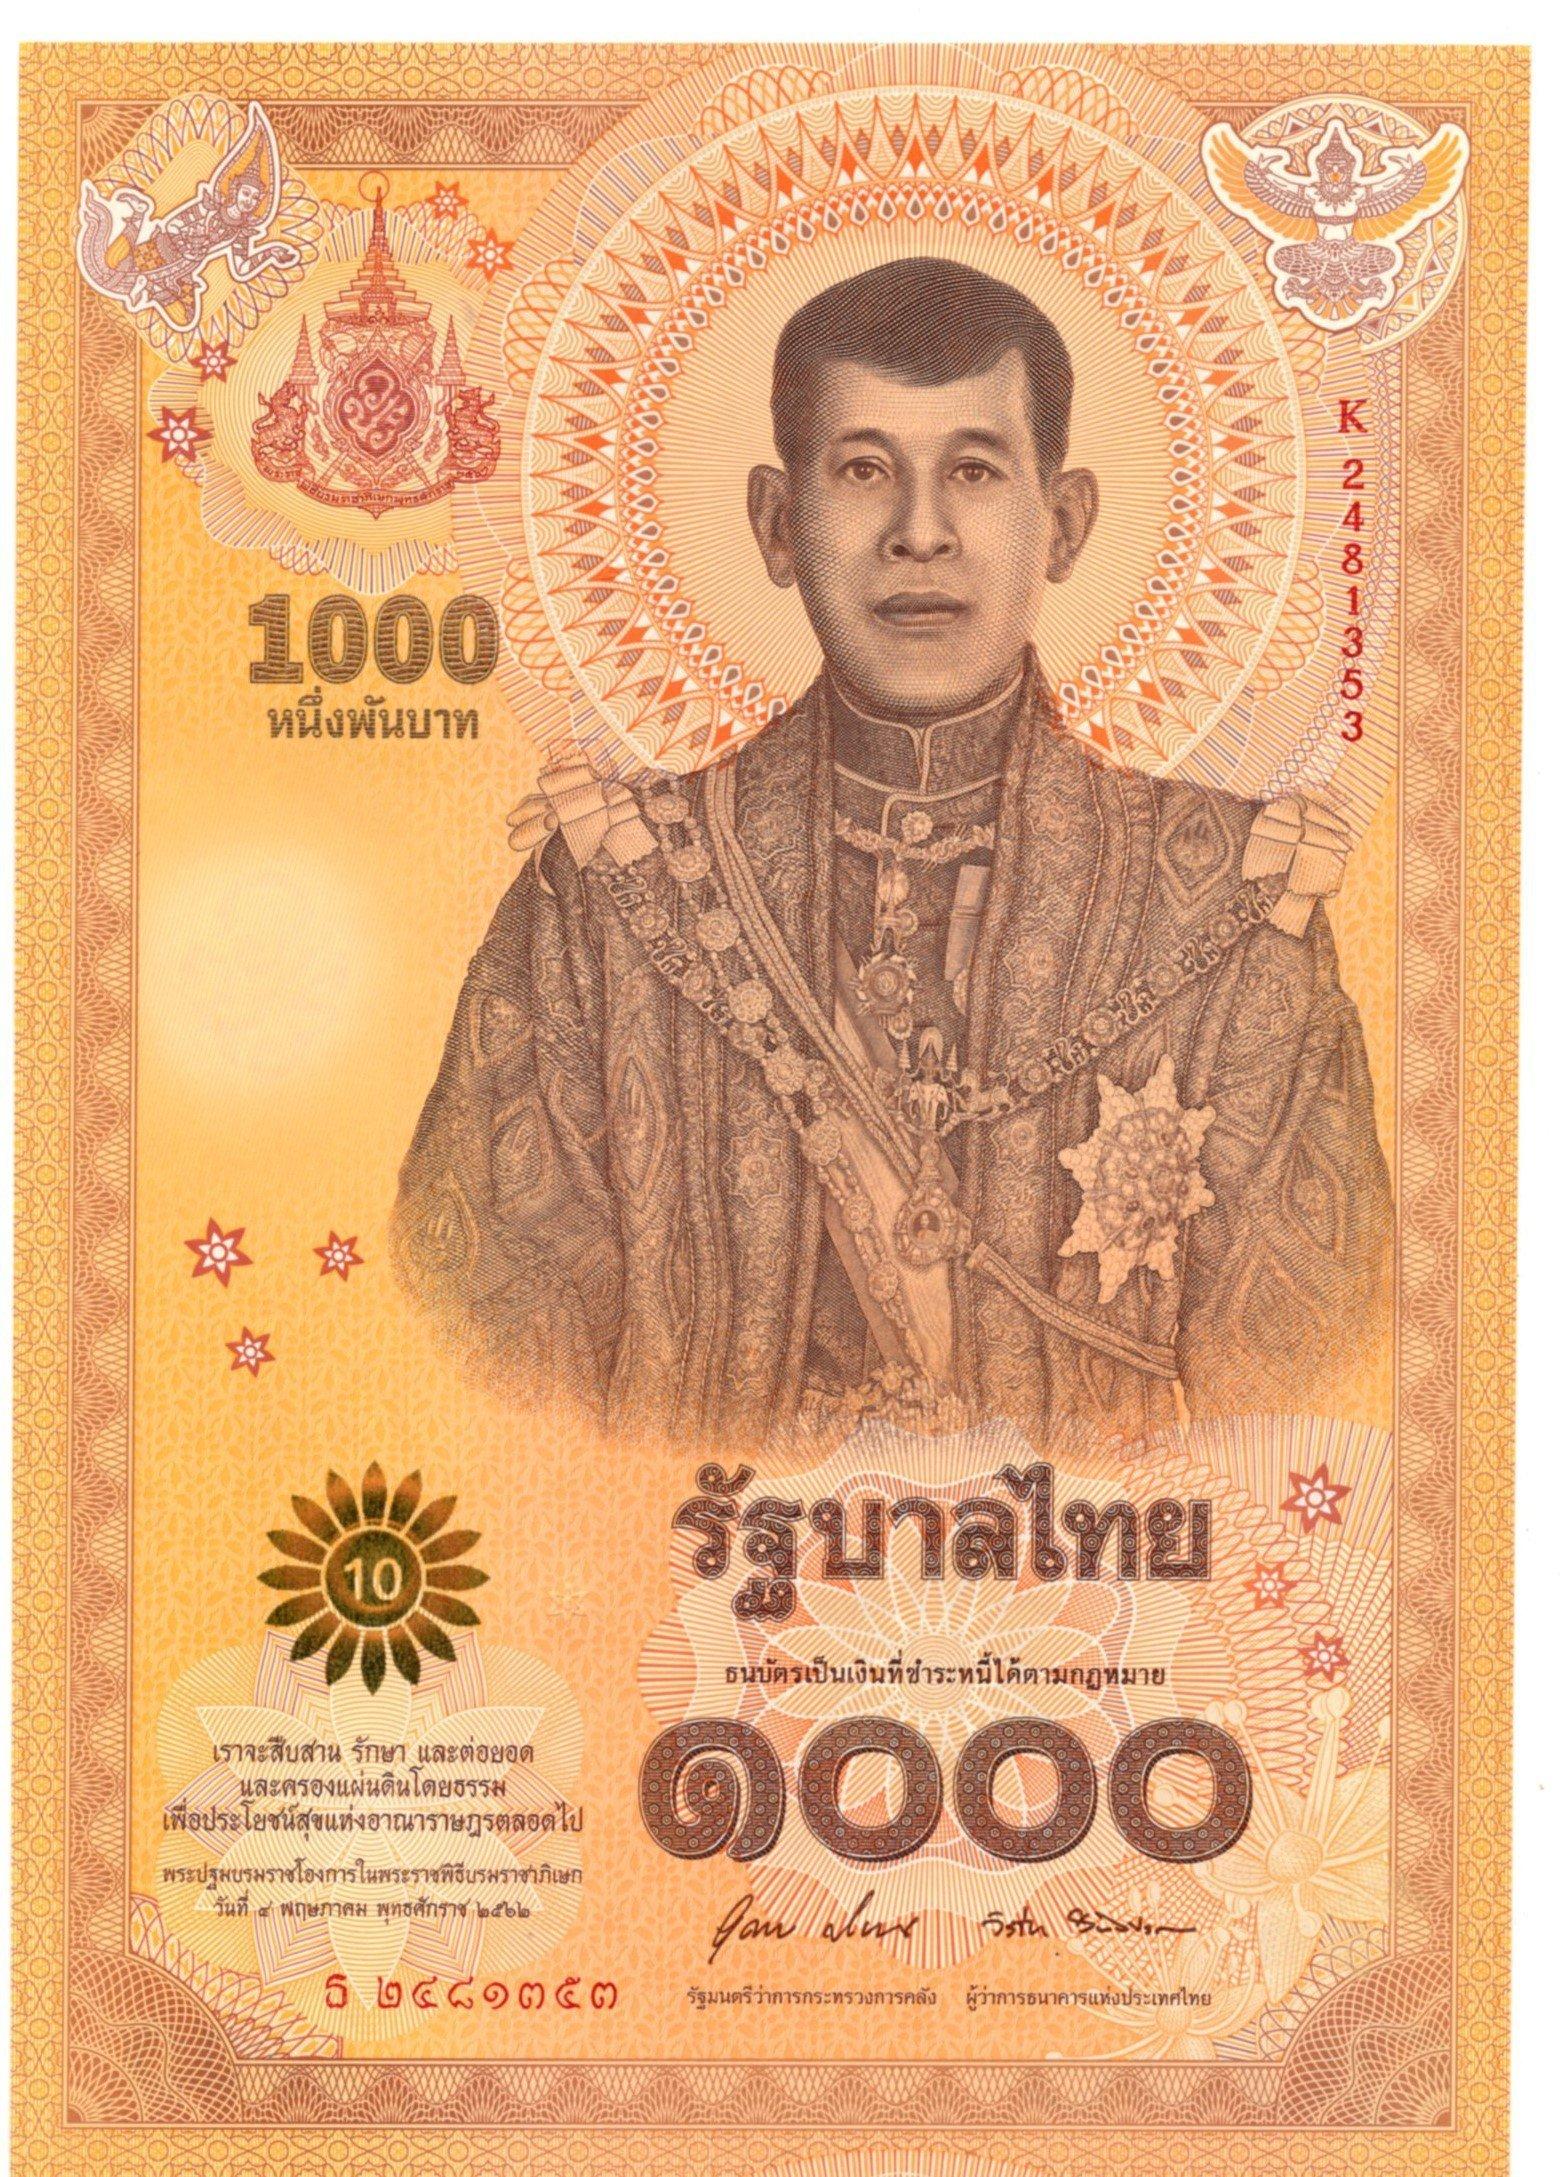 thailand 1000 baht 2020